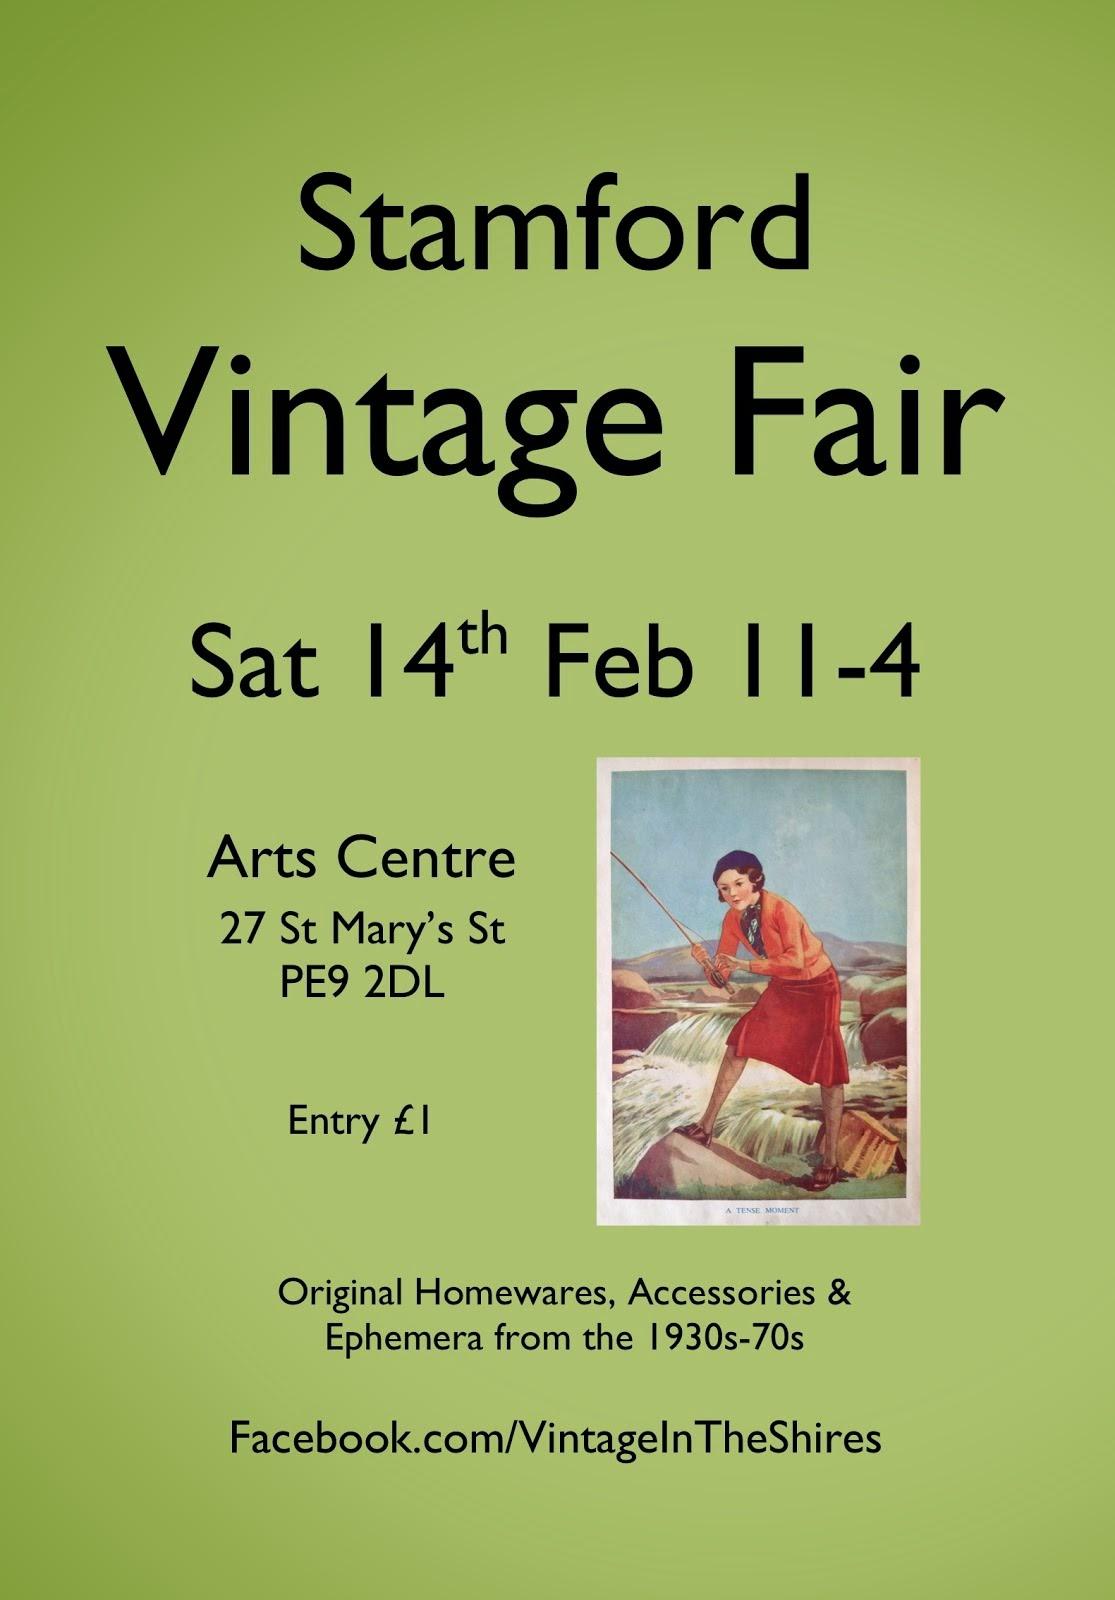 Stamford Vintage Fair